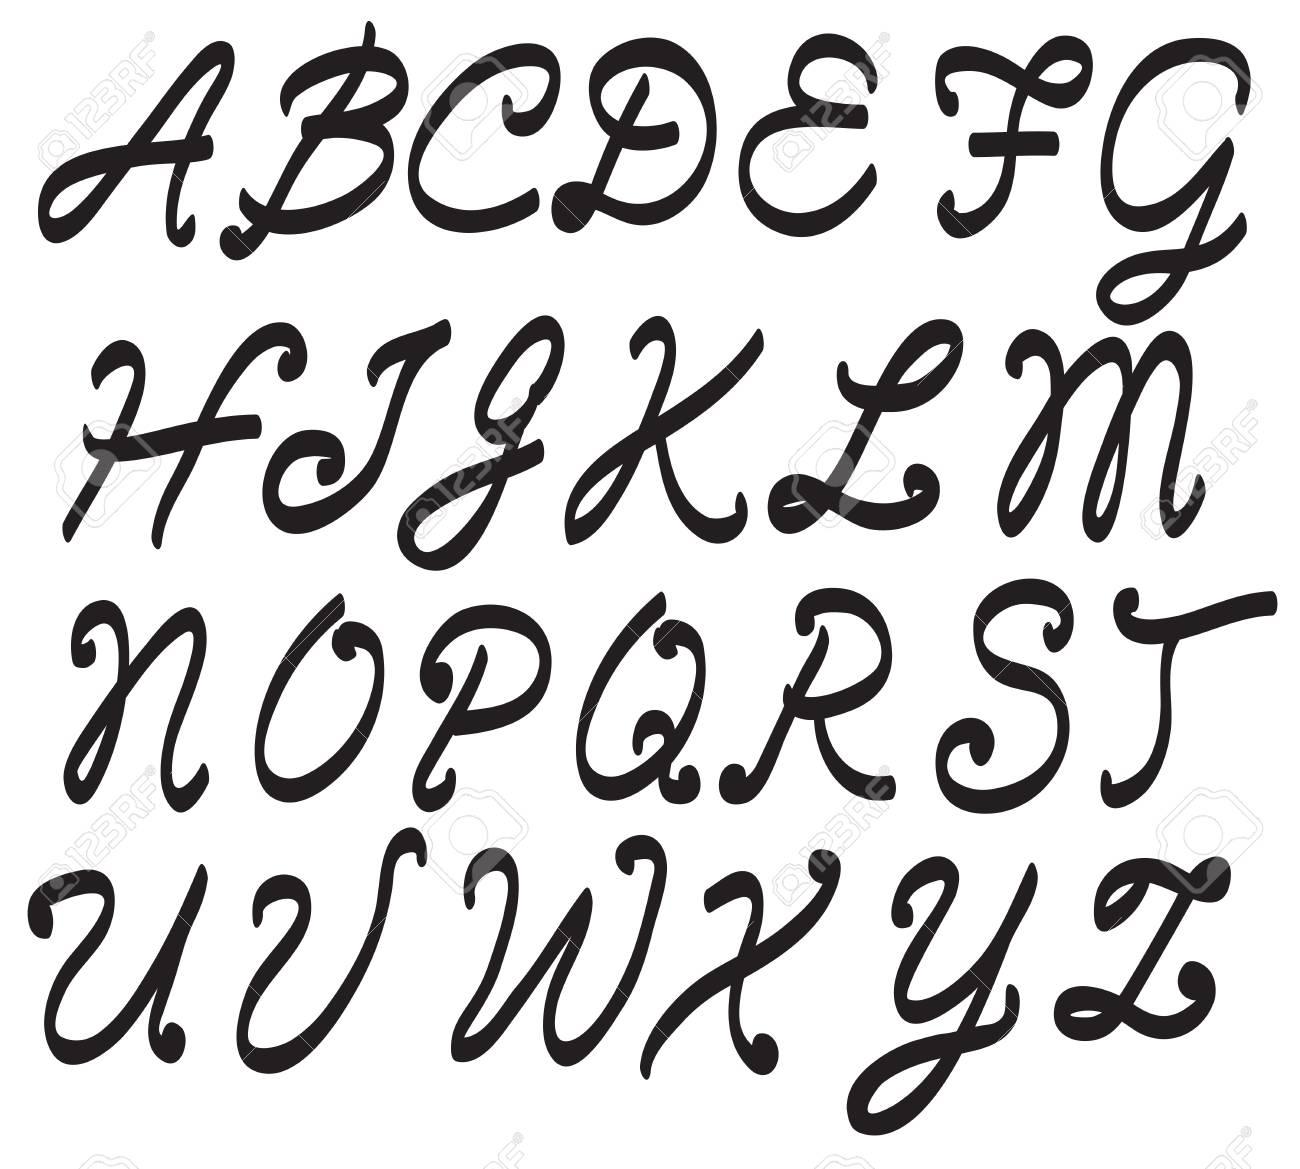 Vector Handwritten Script Font Hand Drawn Brush Style Modern